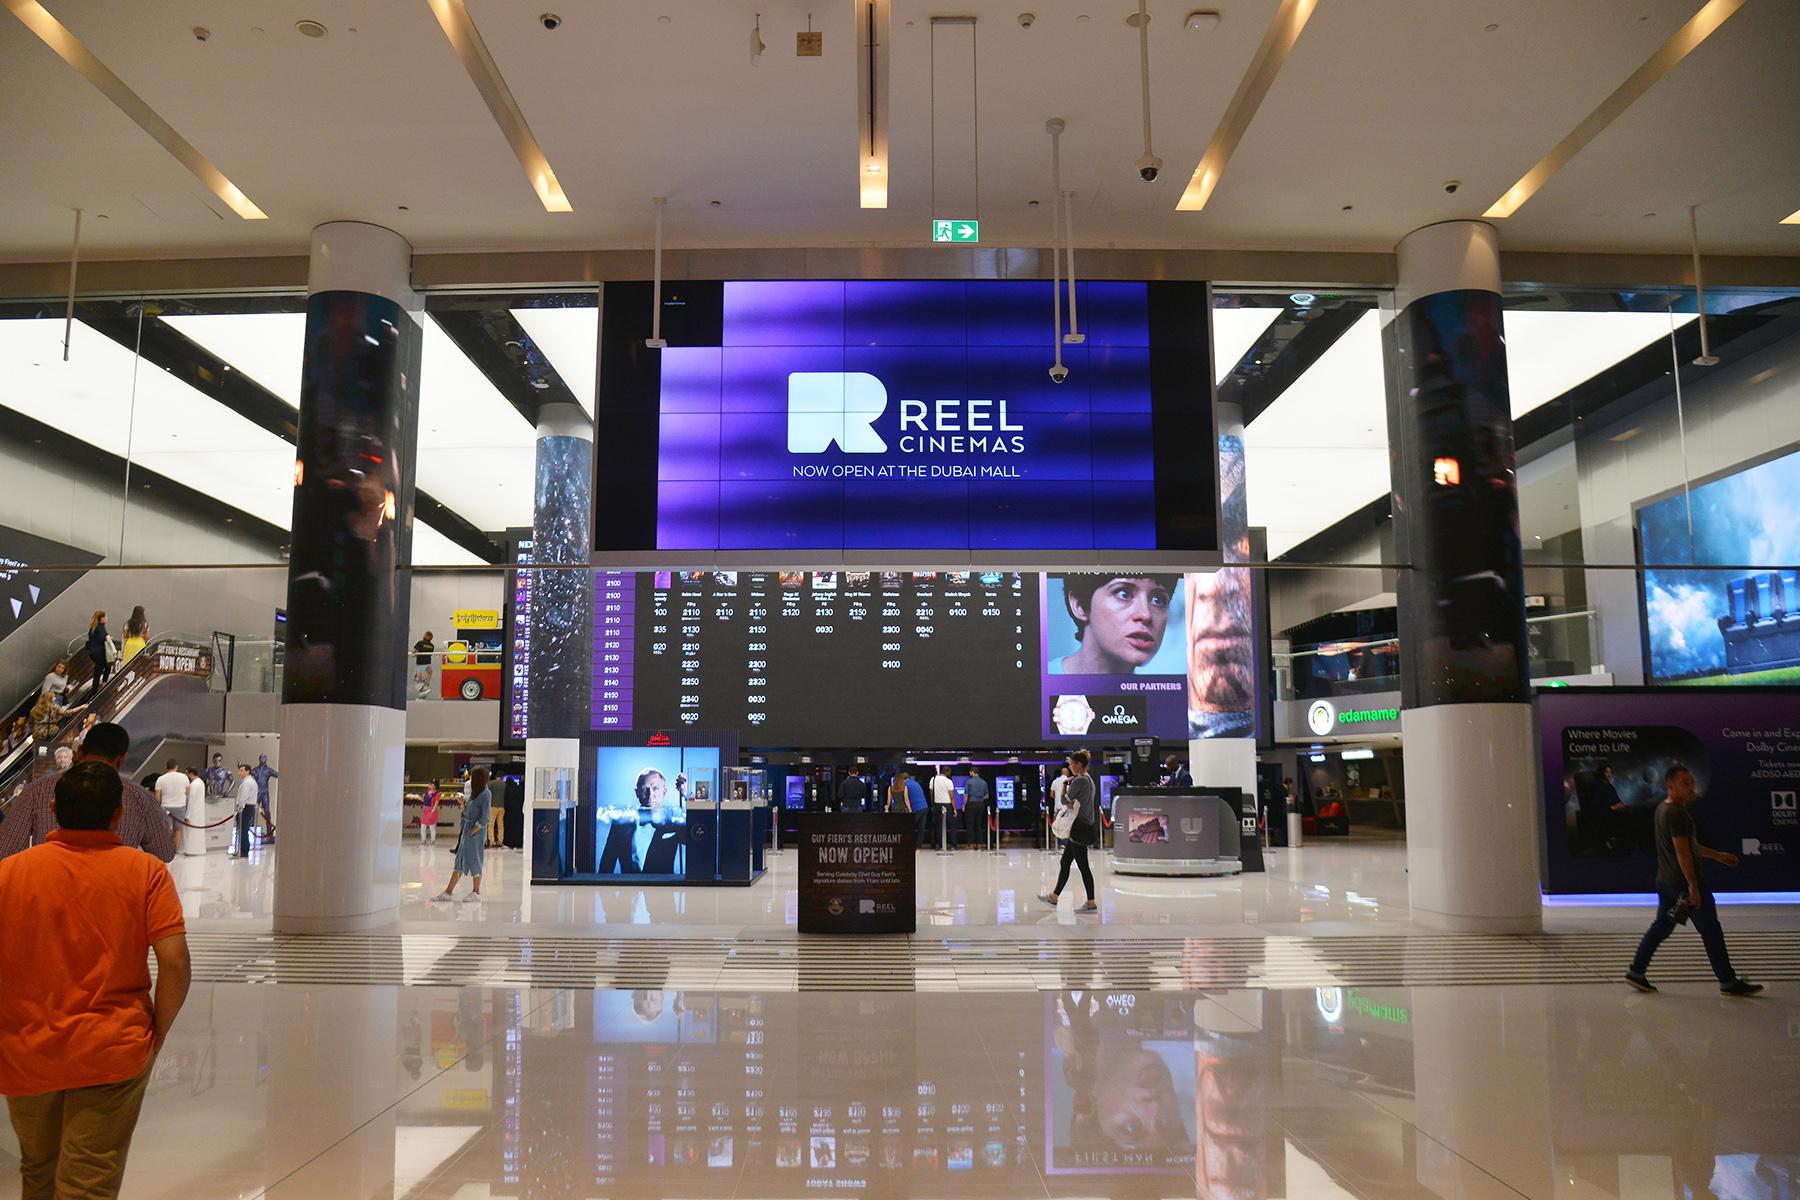 Reel Cinemas at Dubai Mall